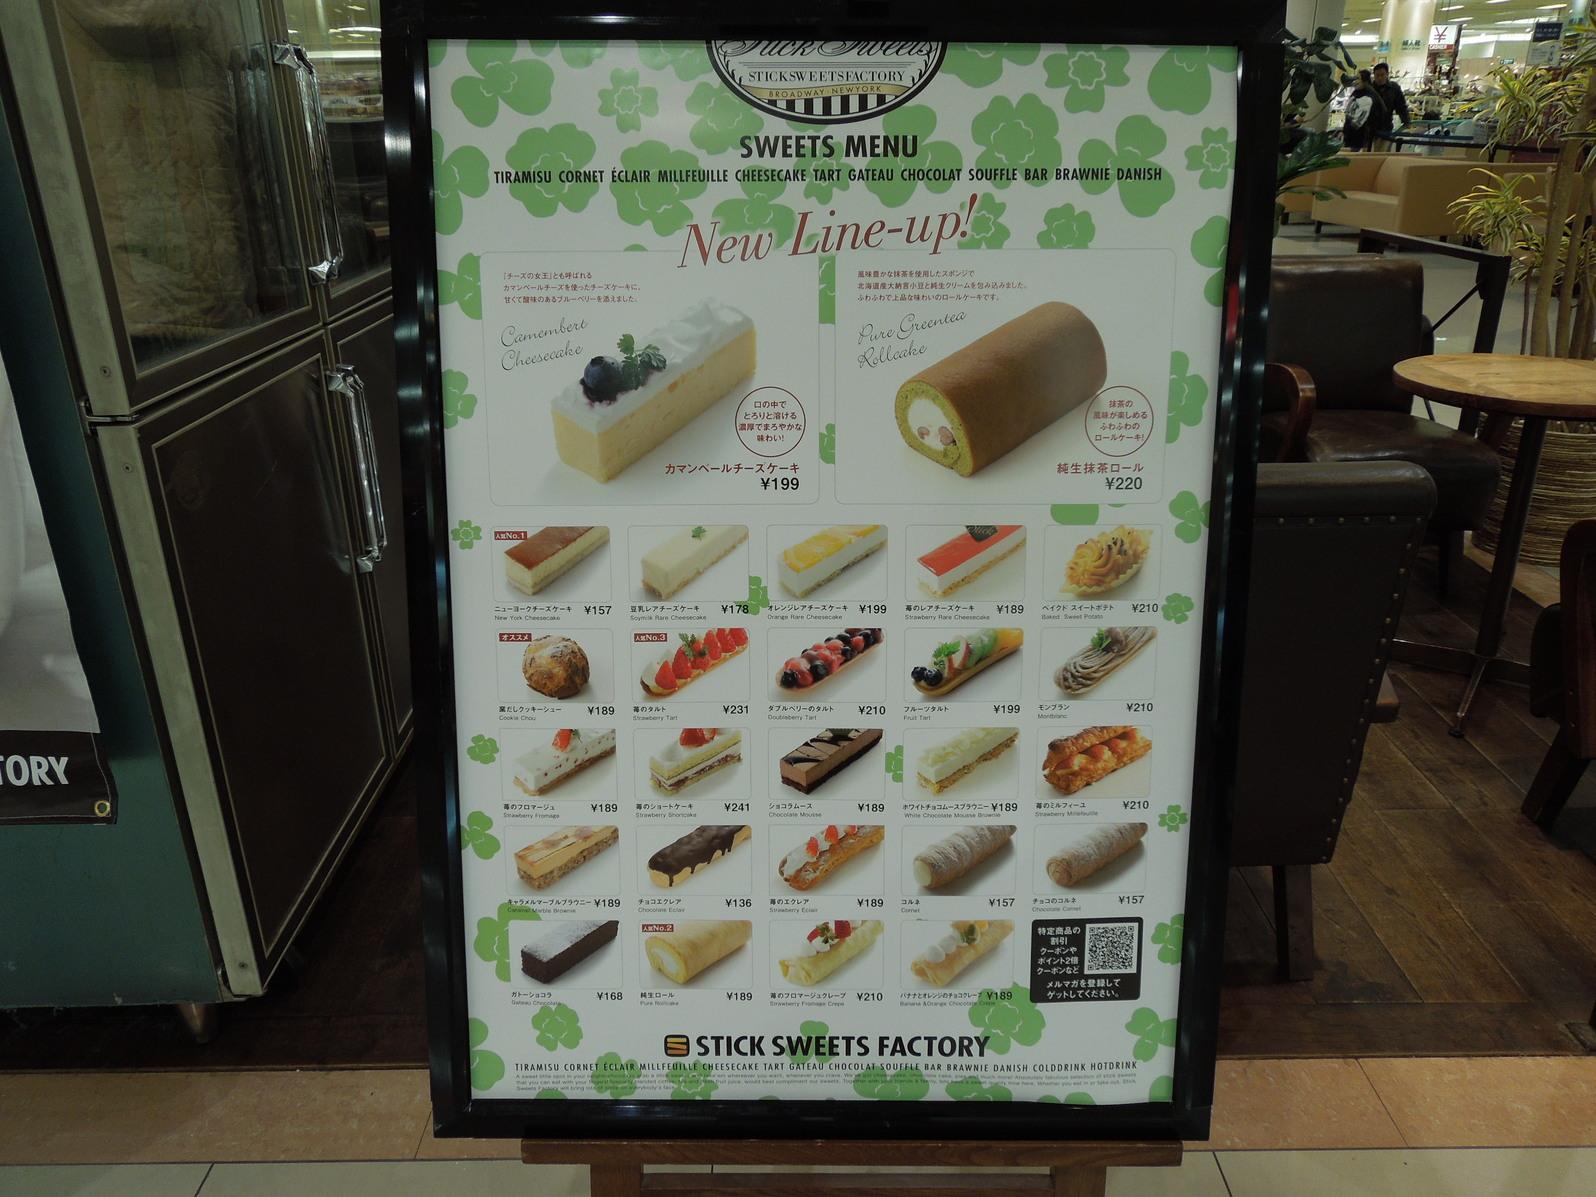 STICK SWEETS FACTORY 広島ゆめタウン店